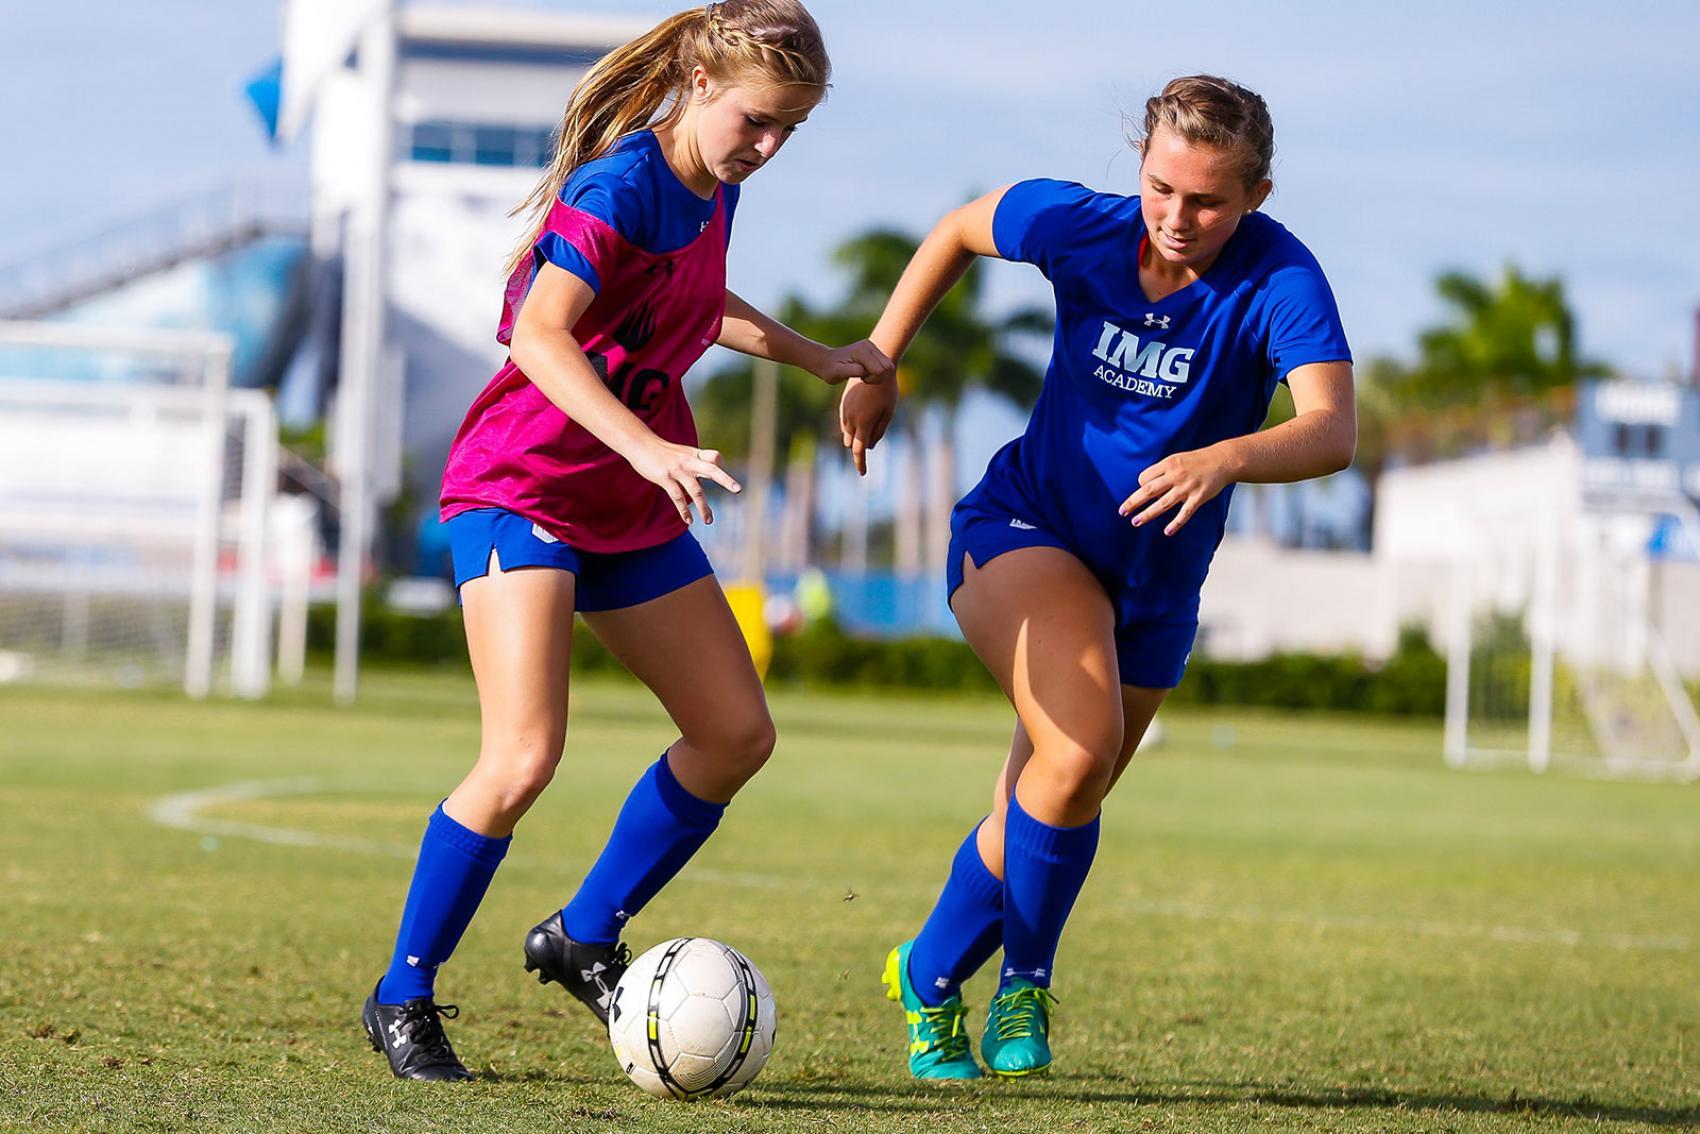 Girls Soccer Academy - Girls Soccer Program   IMG Academy 2019